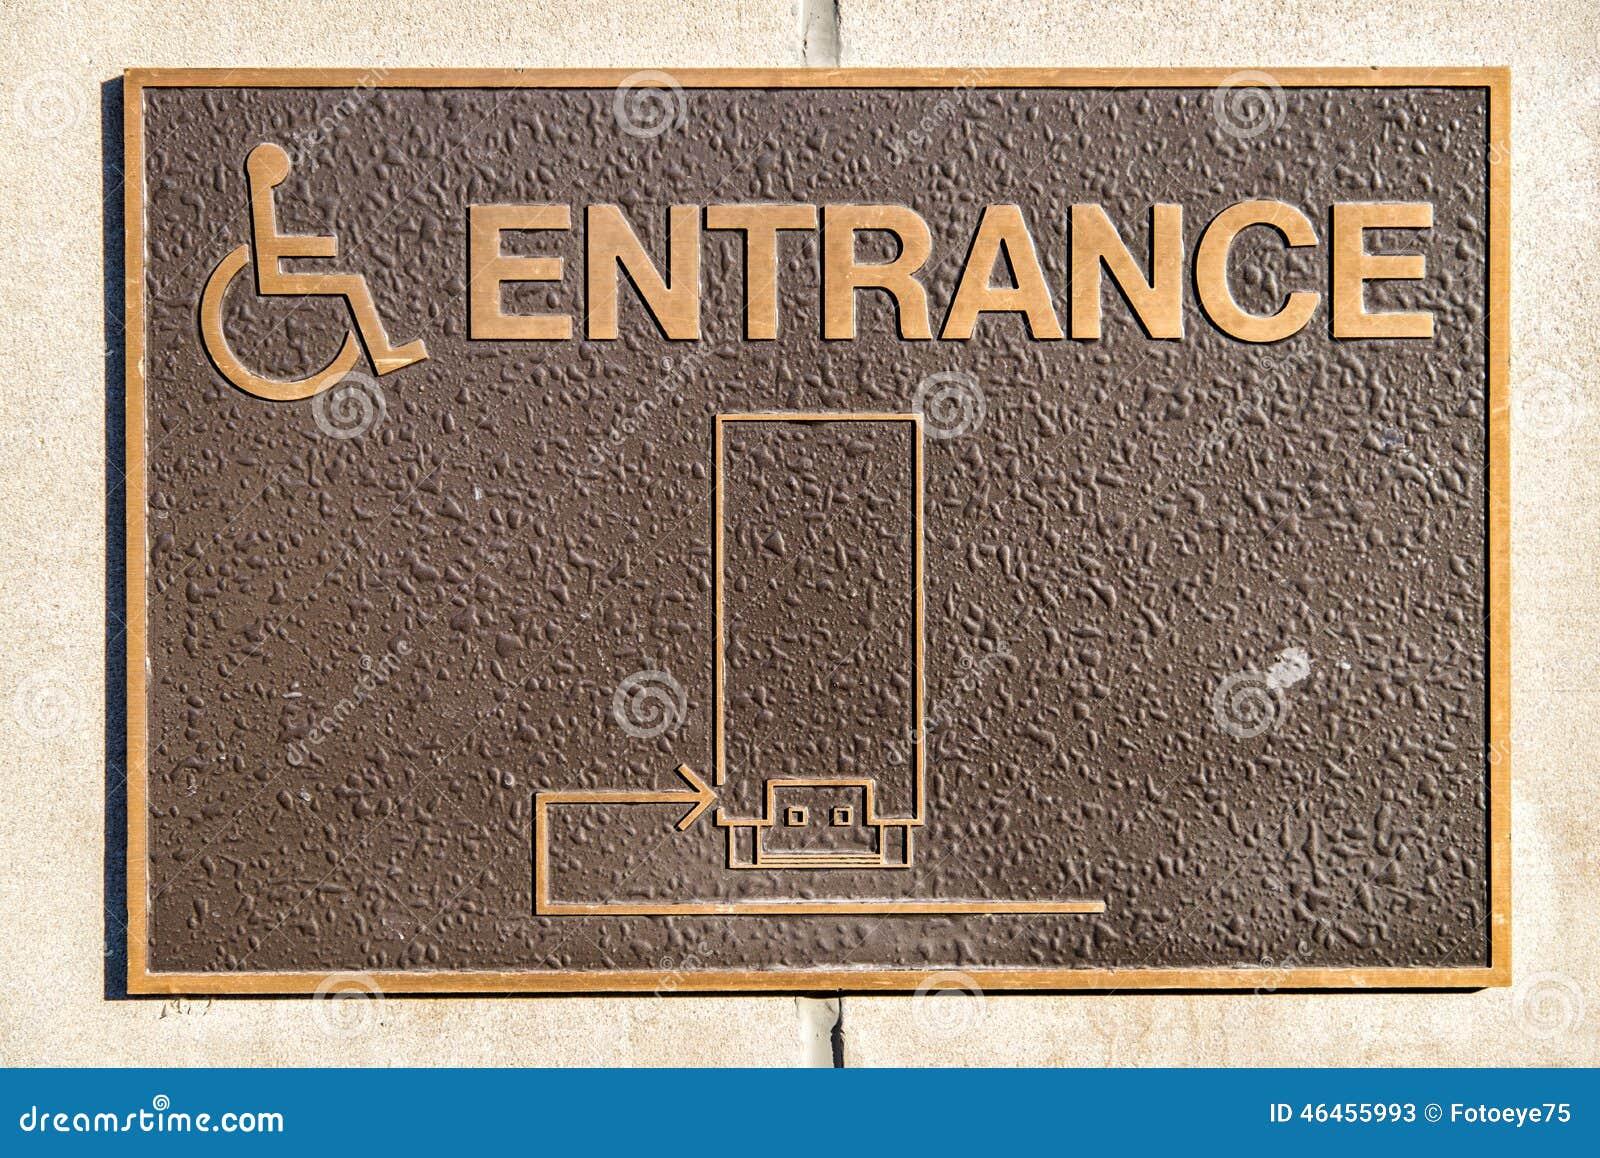 handicap entrance sign stock photo 46455993 megapixl